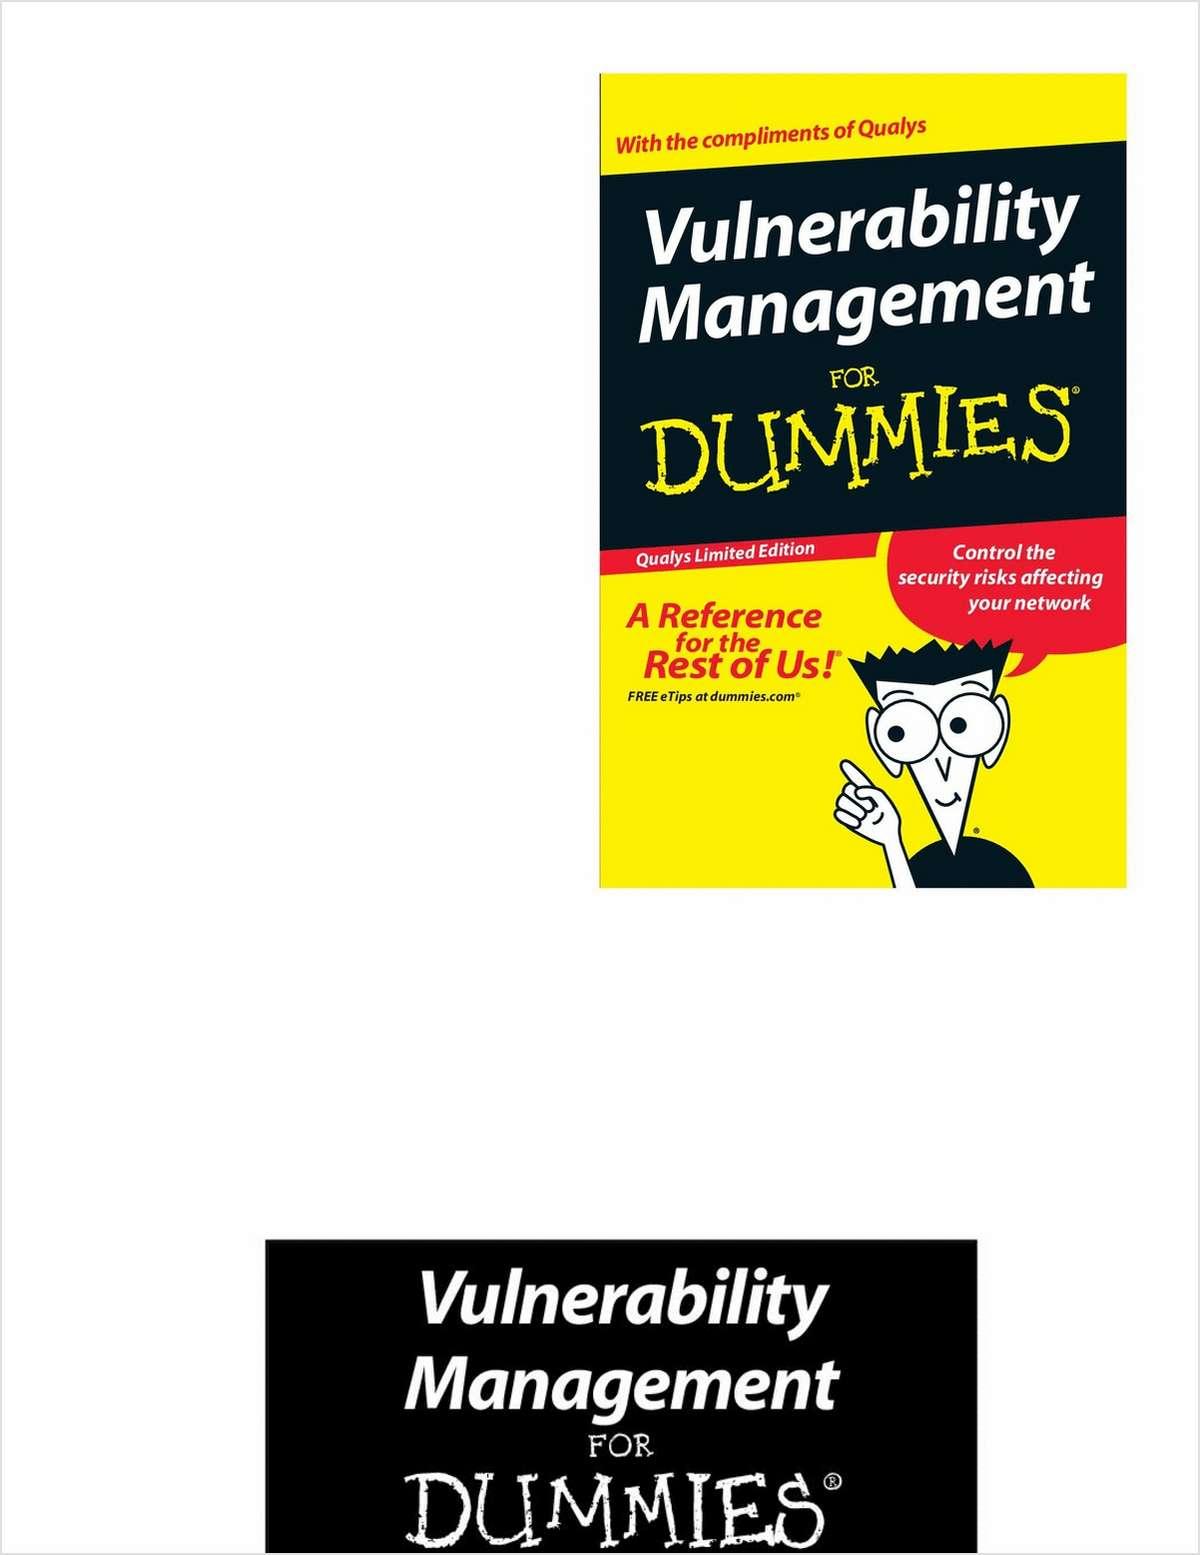 Vulnerability Management for Dummies